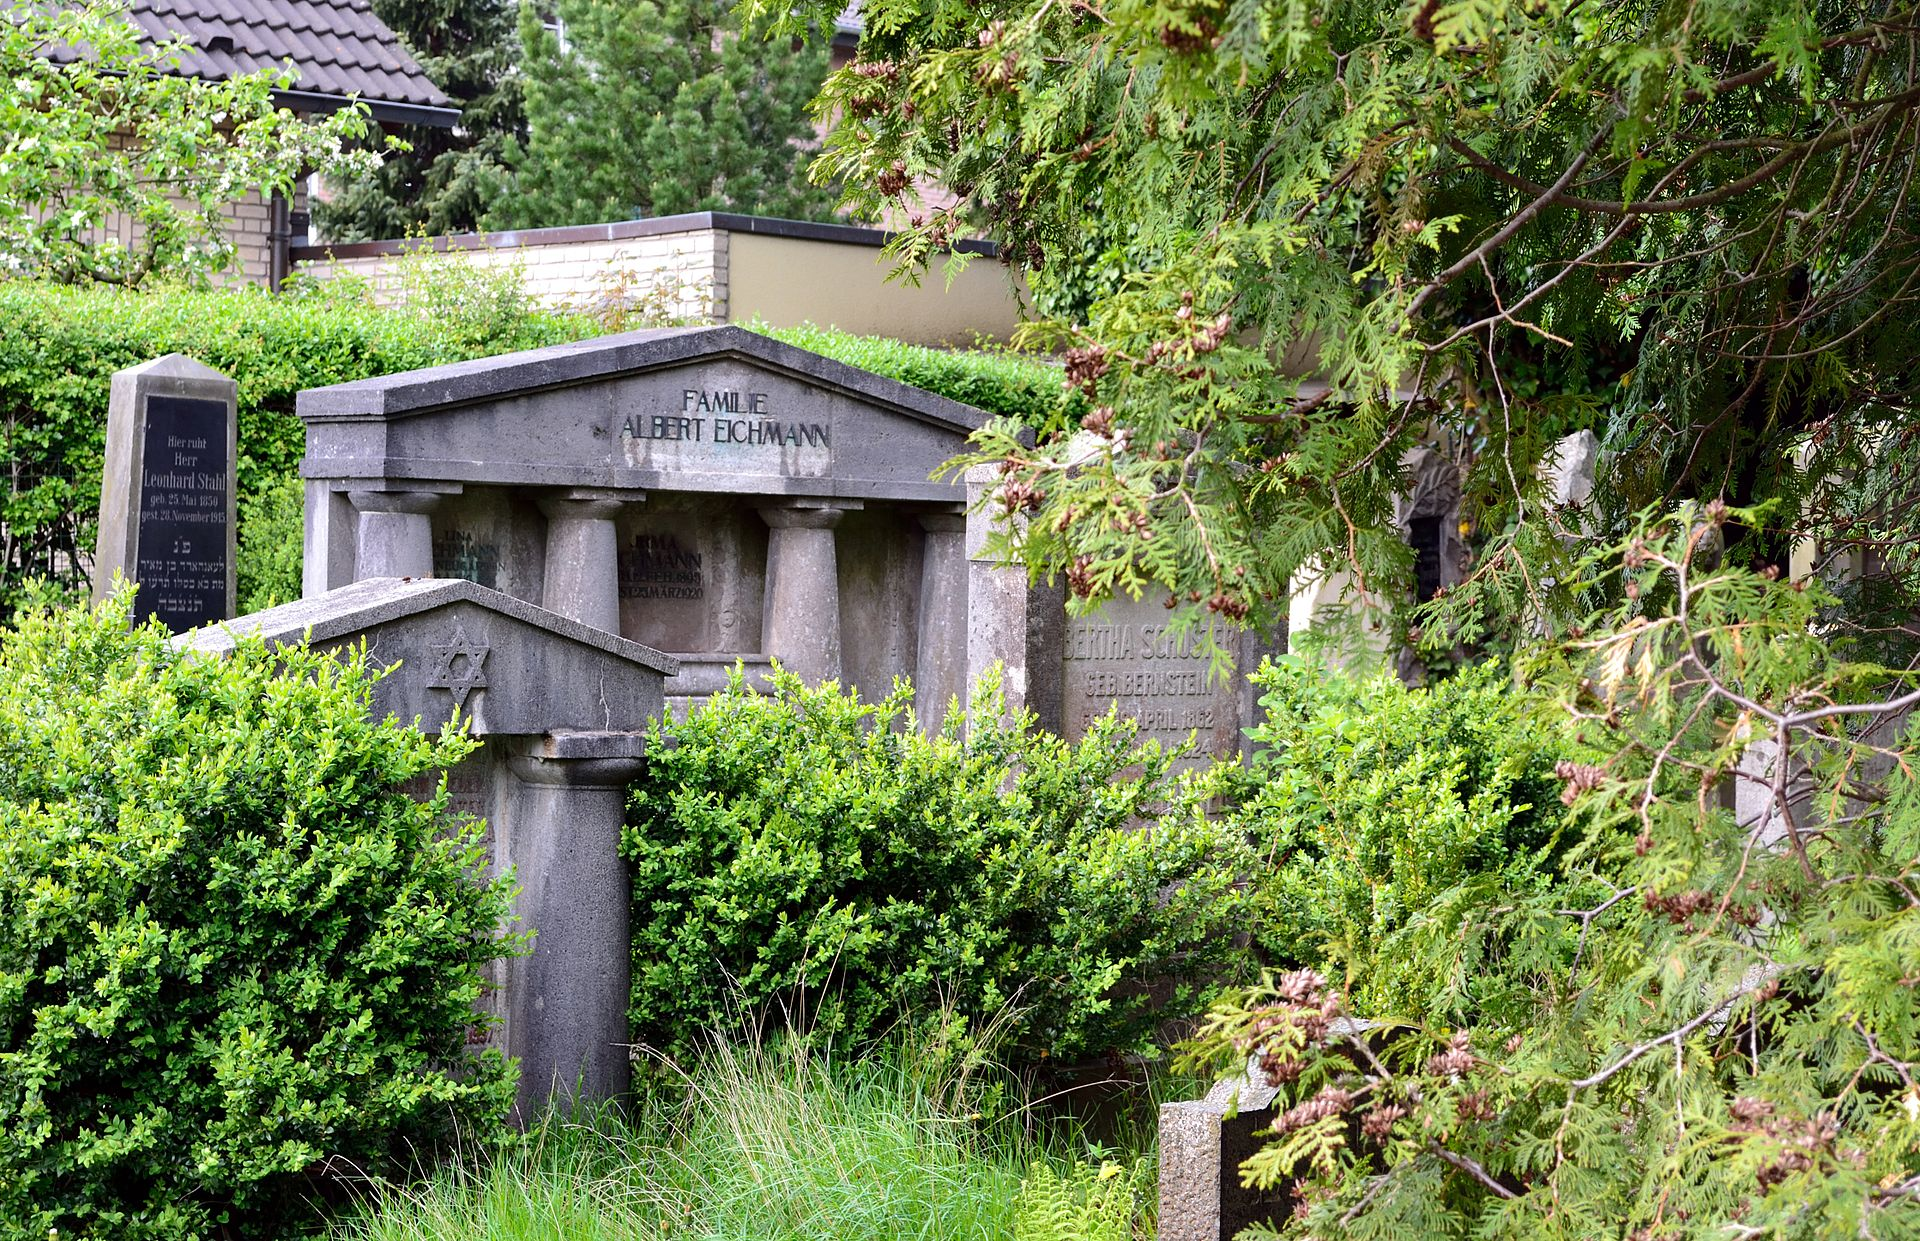 Detmold - 453 - Spitzenkamptwete (Jüdischer Friedhof) (4).jpg